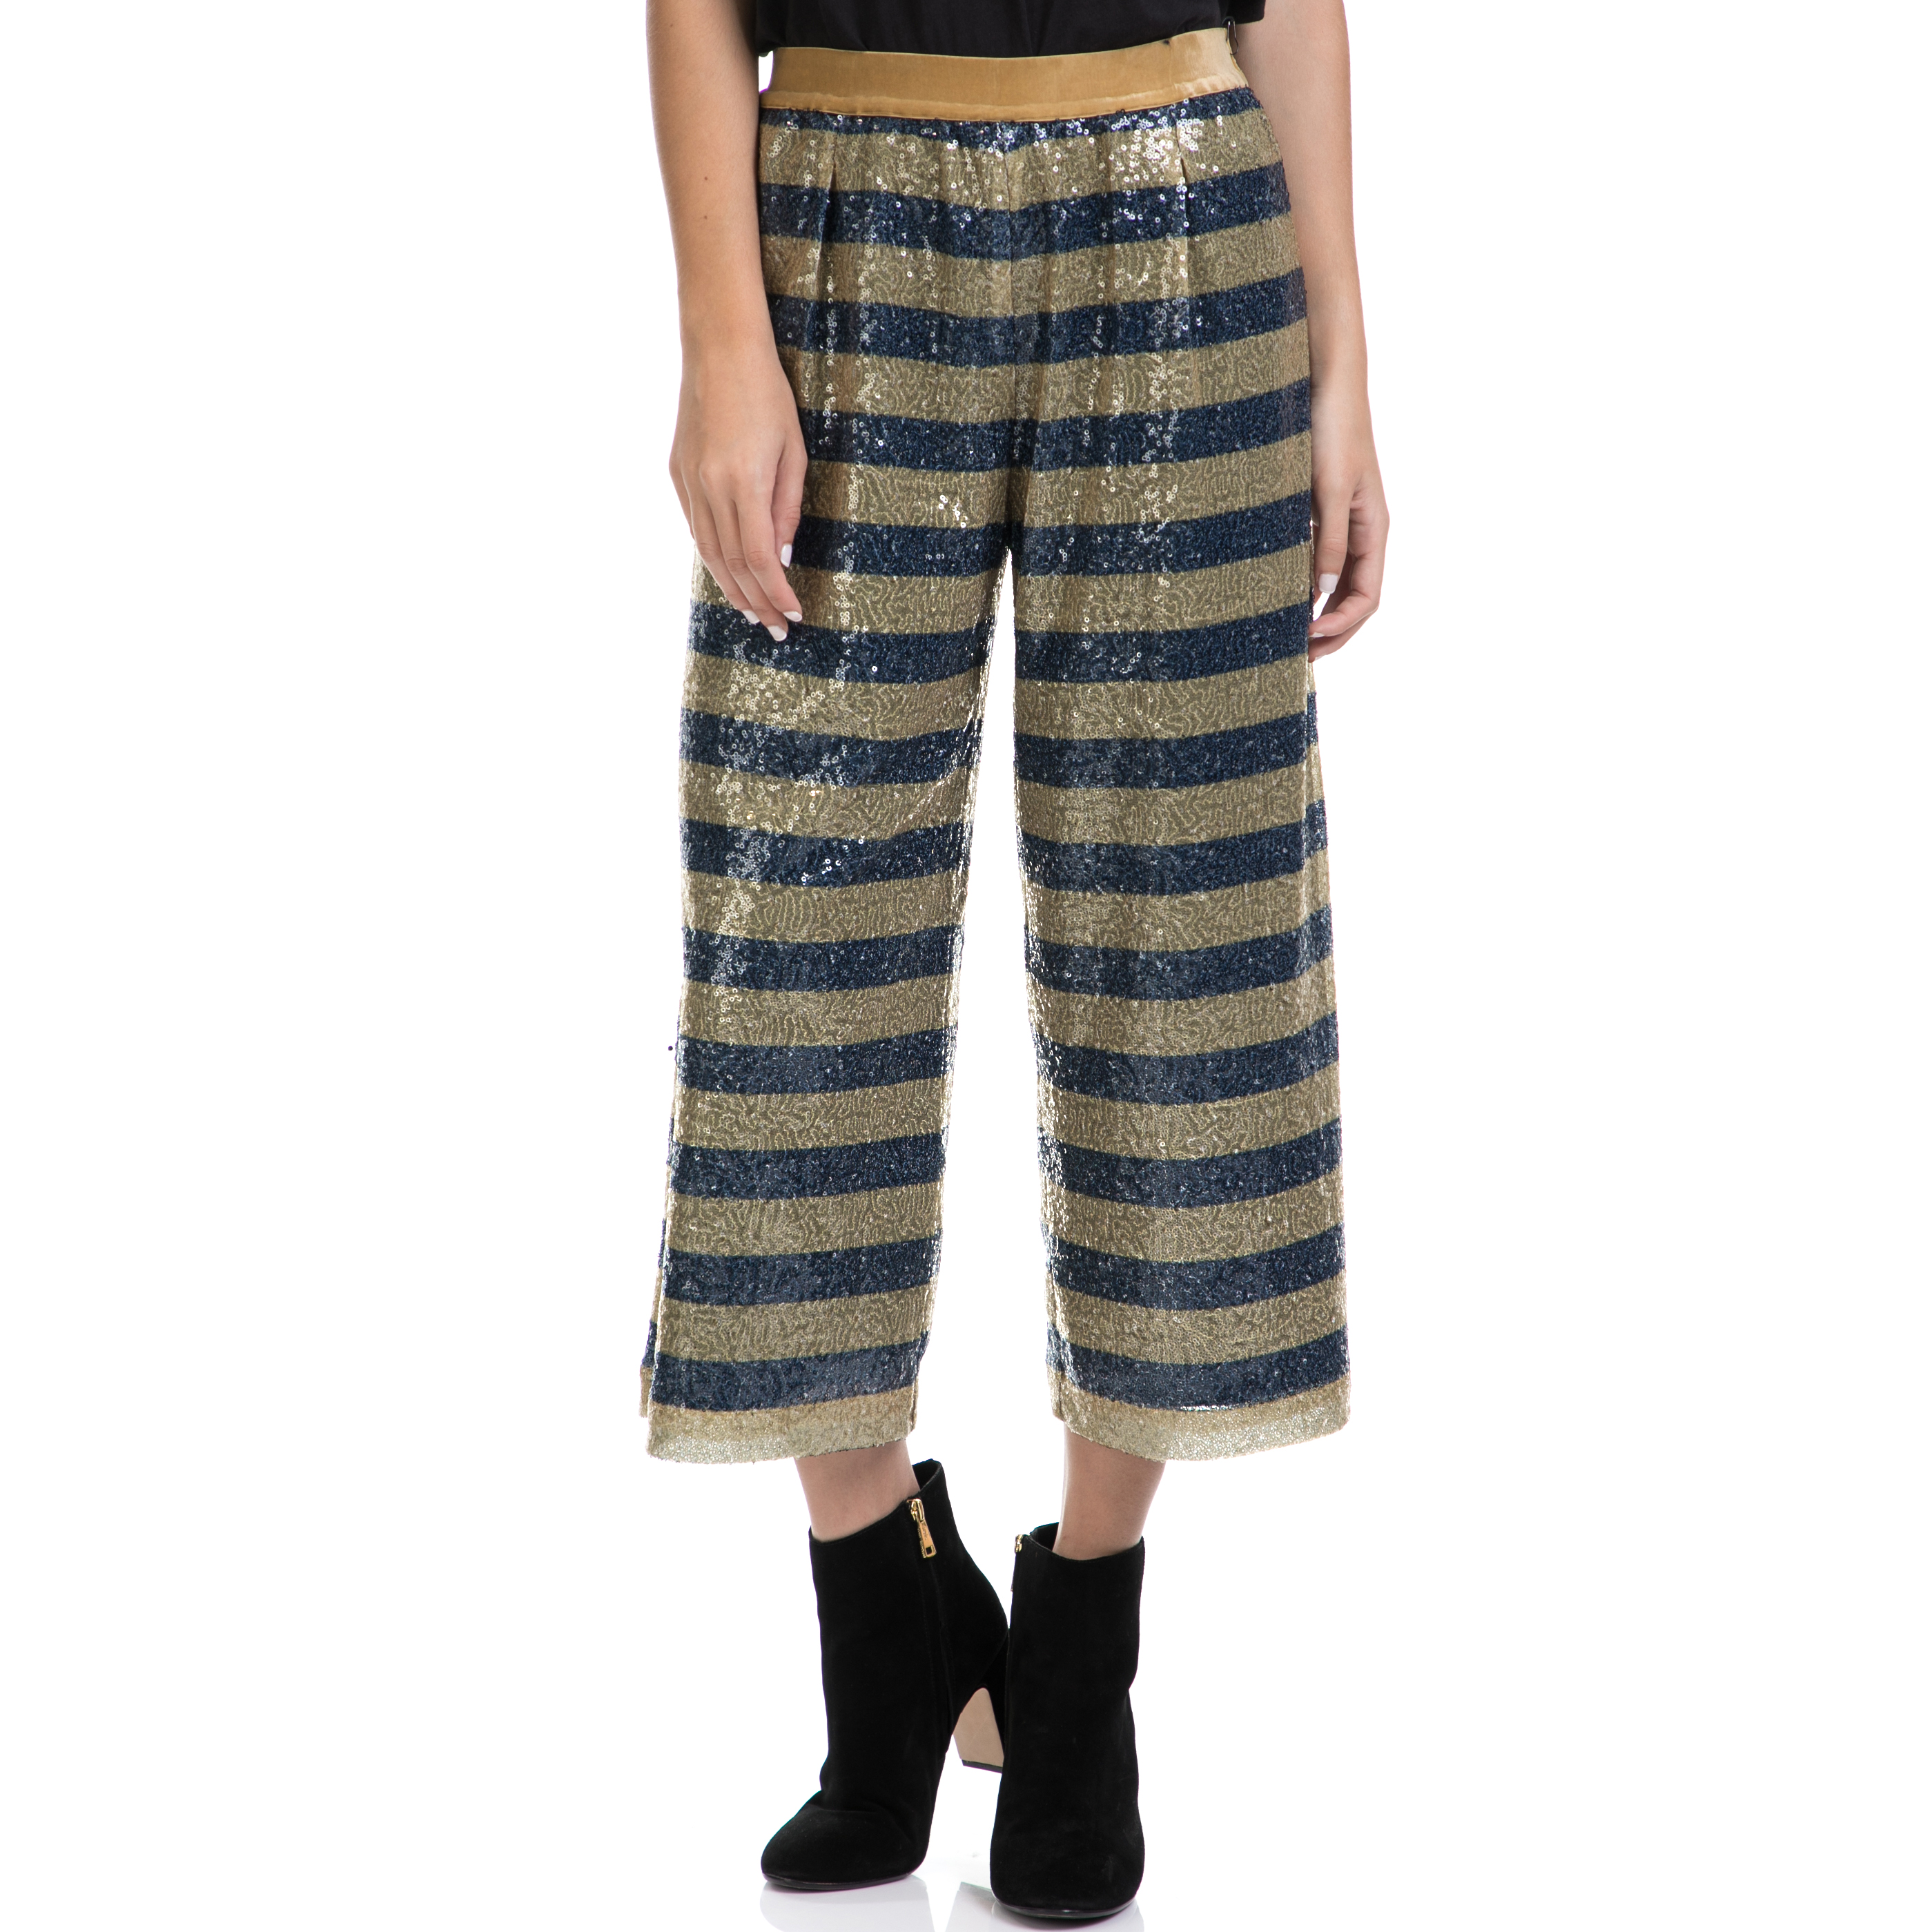 SCOTCH & SODA - Γυναικείο παντελόνι MAISON SCOTCH μπλε-χρυσό γυναικεία ρούχα παντελόνια